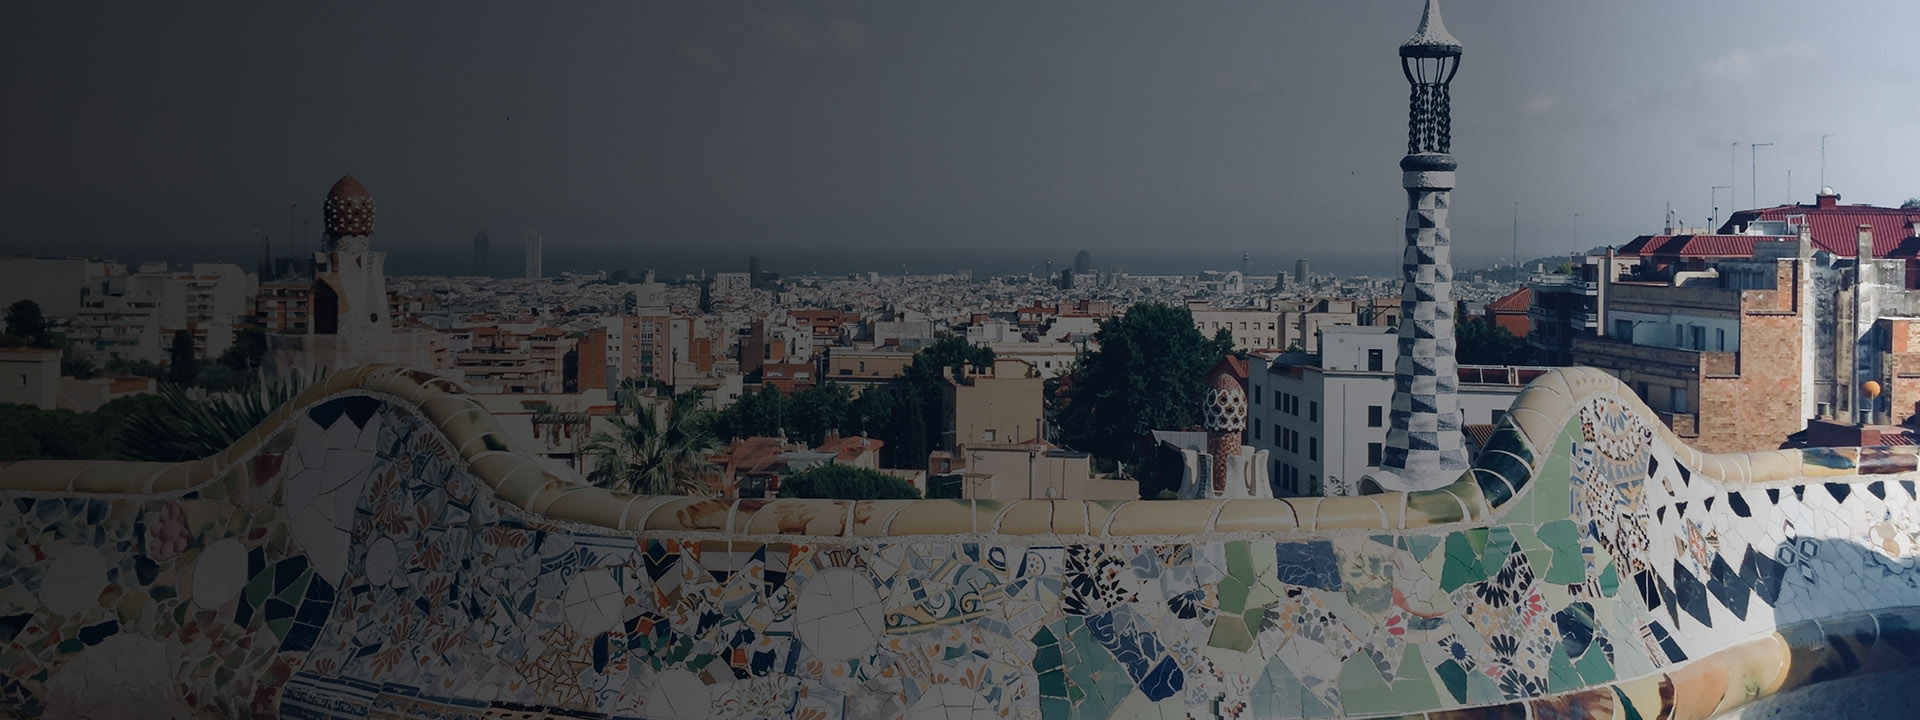 Microsoft at ICASSP 2020 in Barcelona, Spain